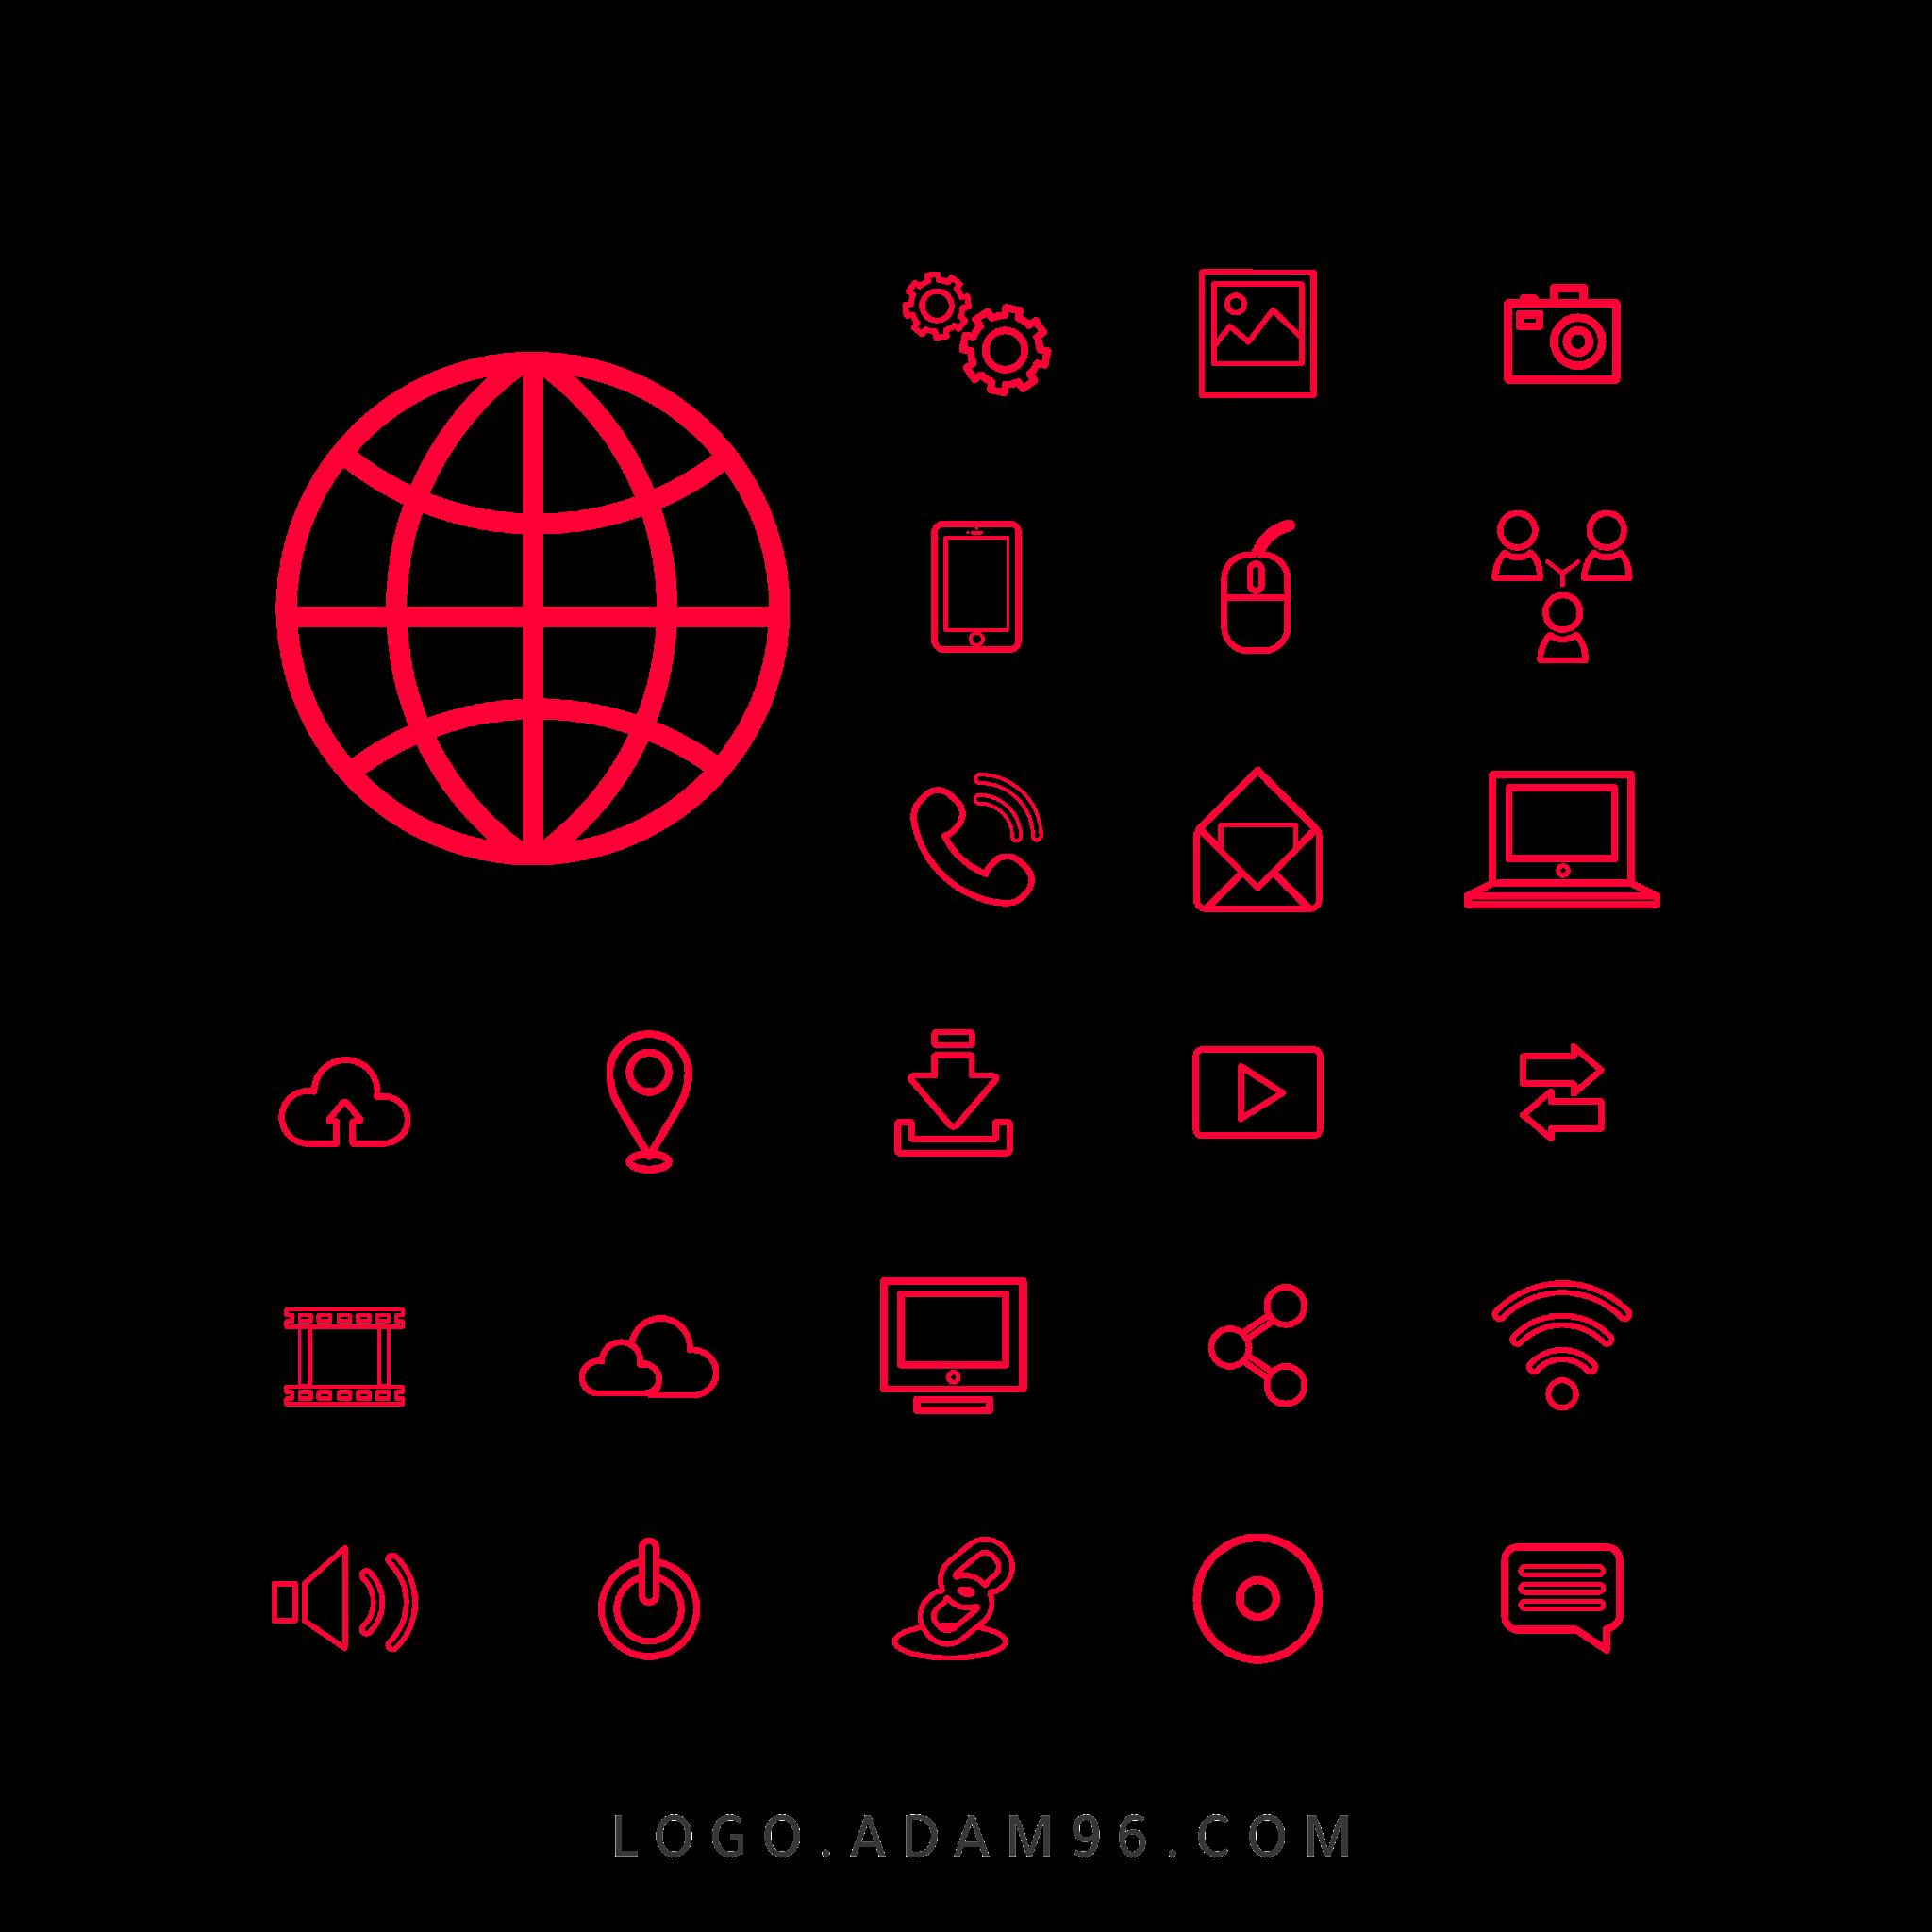 تحميل ايقونات تكنولوجيا لتصميم المواقع Free Icons PNG